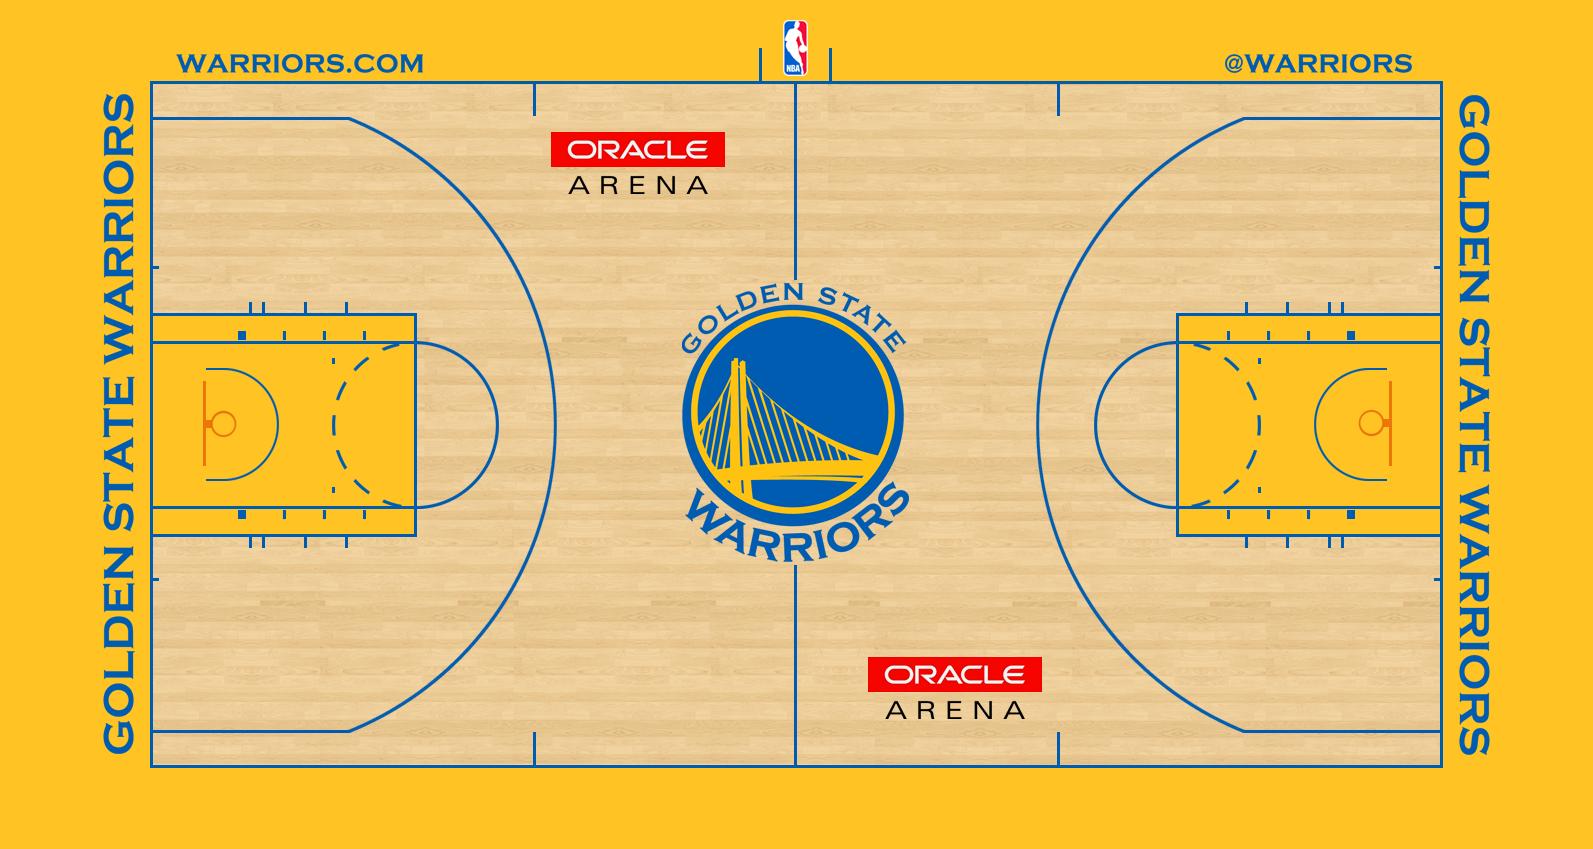 Golden State Warriors Playing Surface Playing Surface (2012/13-2018/19) - Golden State Warriors home court design - Oracle Arena SportsLogos.Net